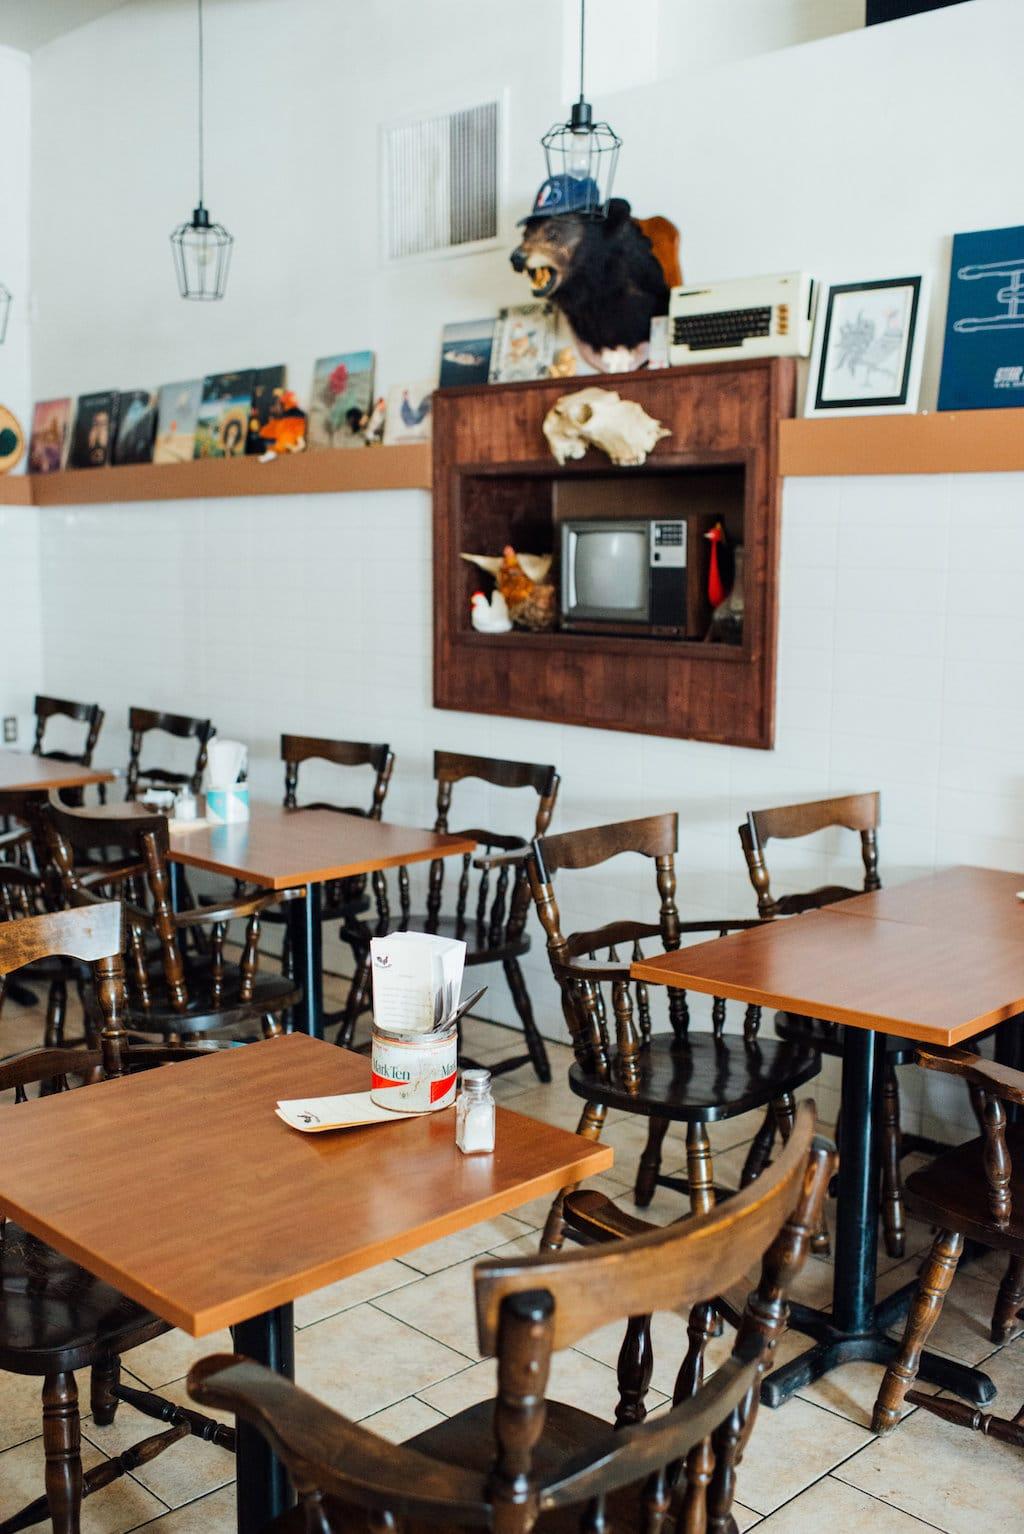 coq de l'Est tetraultville restaurant montreal